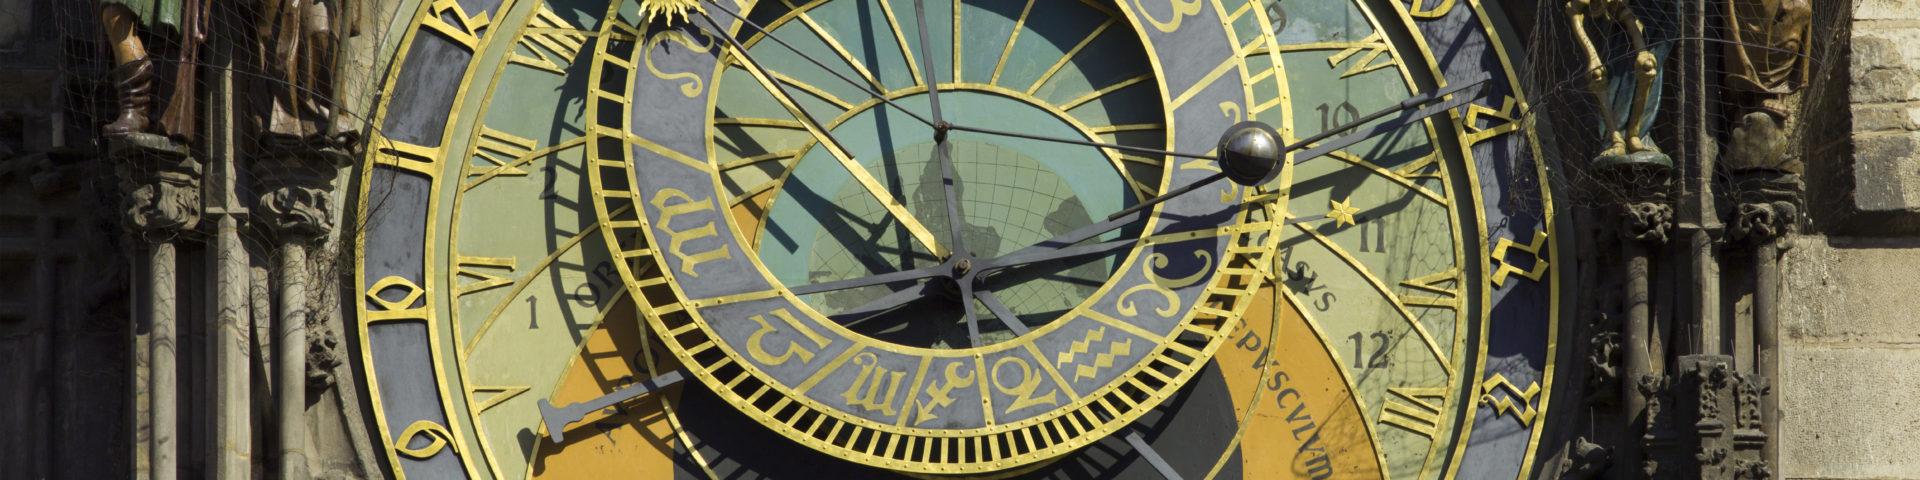 https://commons.wikimedia.org/wiki/File:Czech-2013-Prague-Astronomical_clock_face.jpg